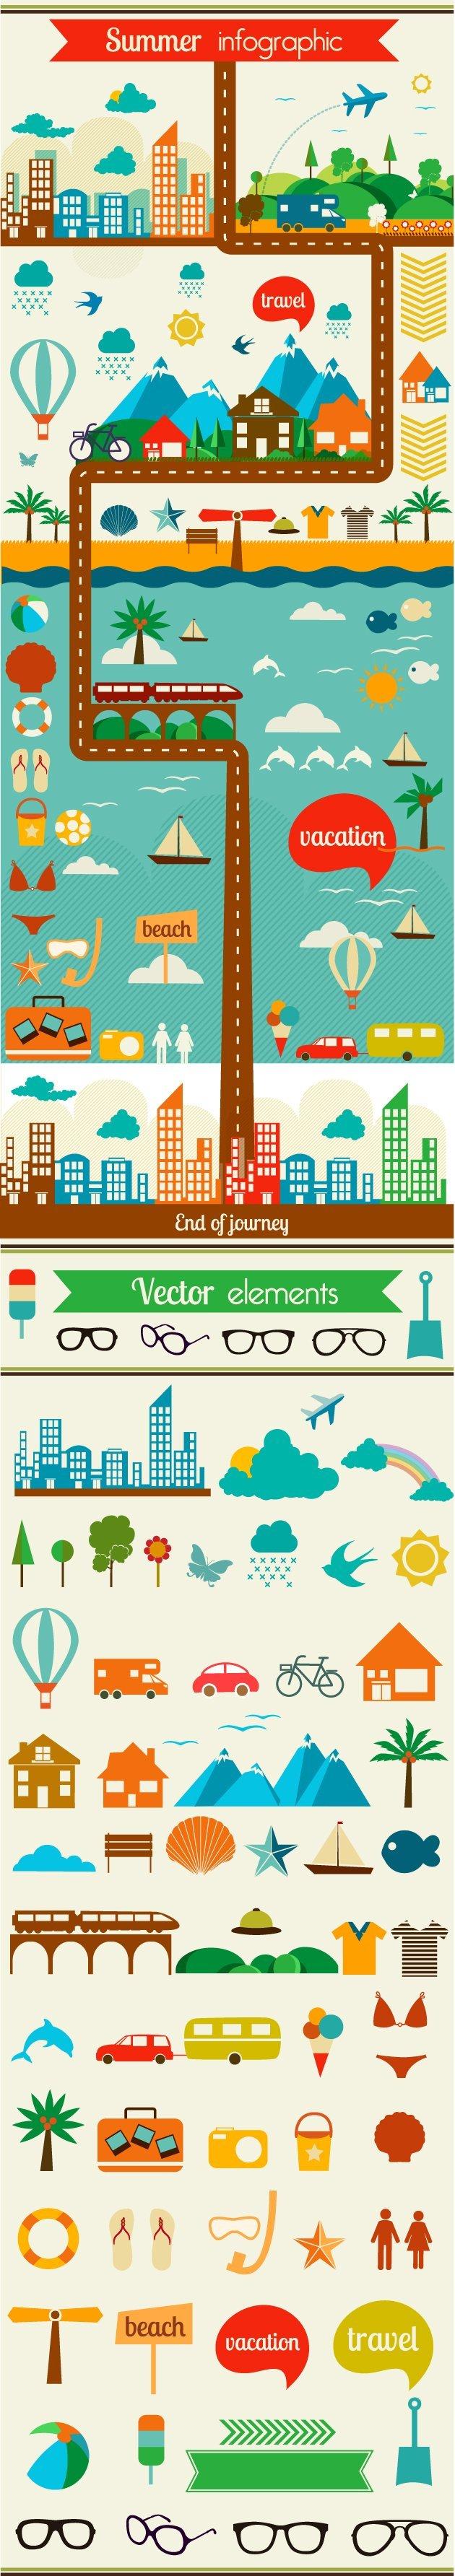 designtnt-vector-summer-infographic-large